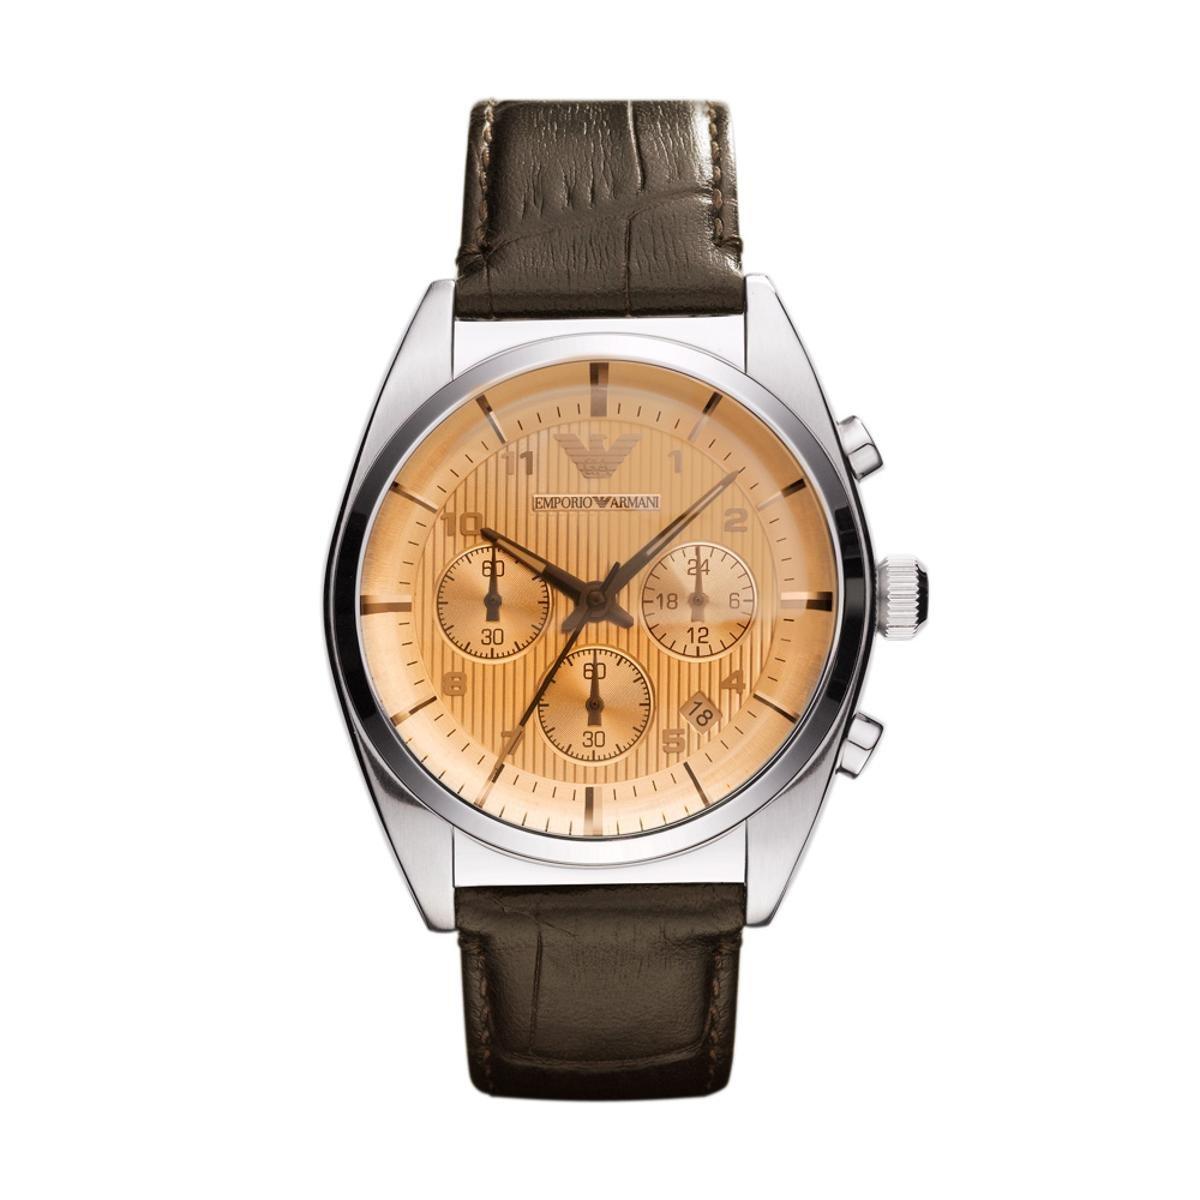 a27c6b5aeb5 Relógio Emporio Armani Masculino Marrom - HAR0395 Z HAR0395 Z - Compre  Agora